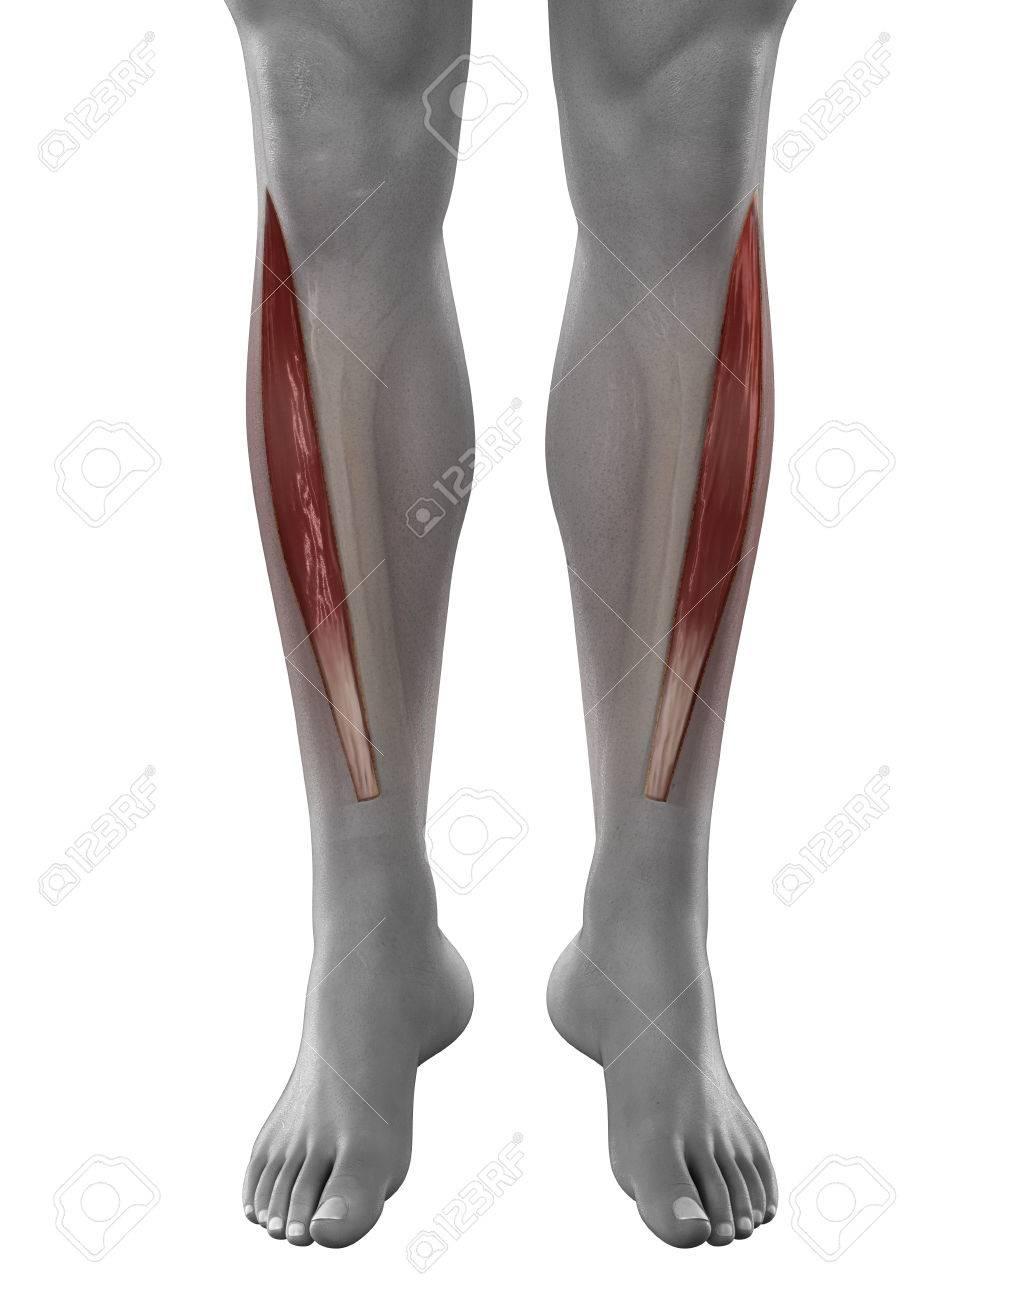 Tibial Anterior Vista Músculos Masculinos Anatomía Anterior Aislado ...